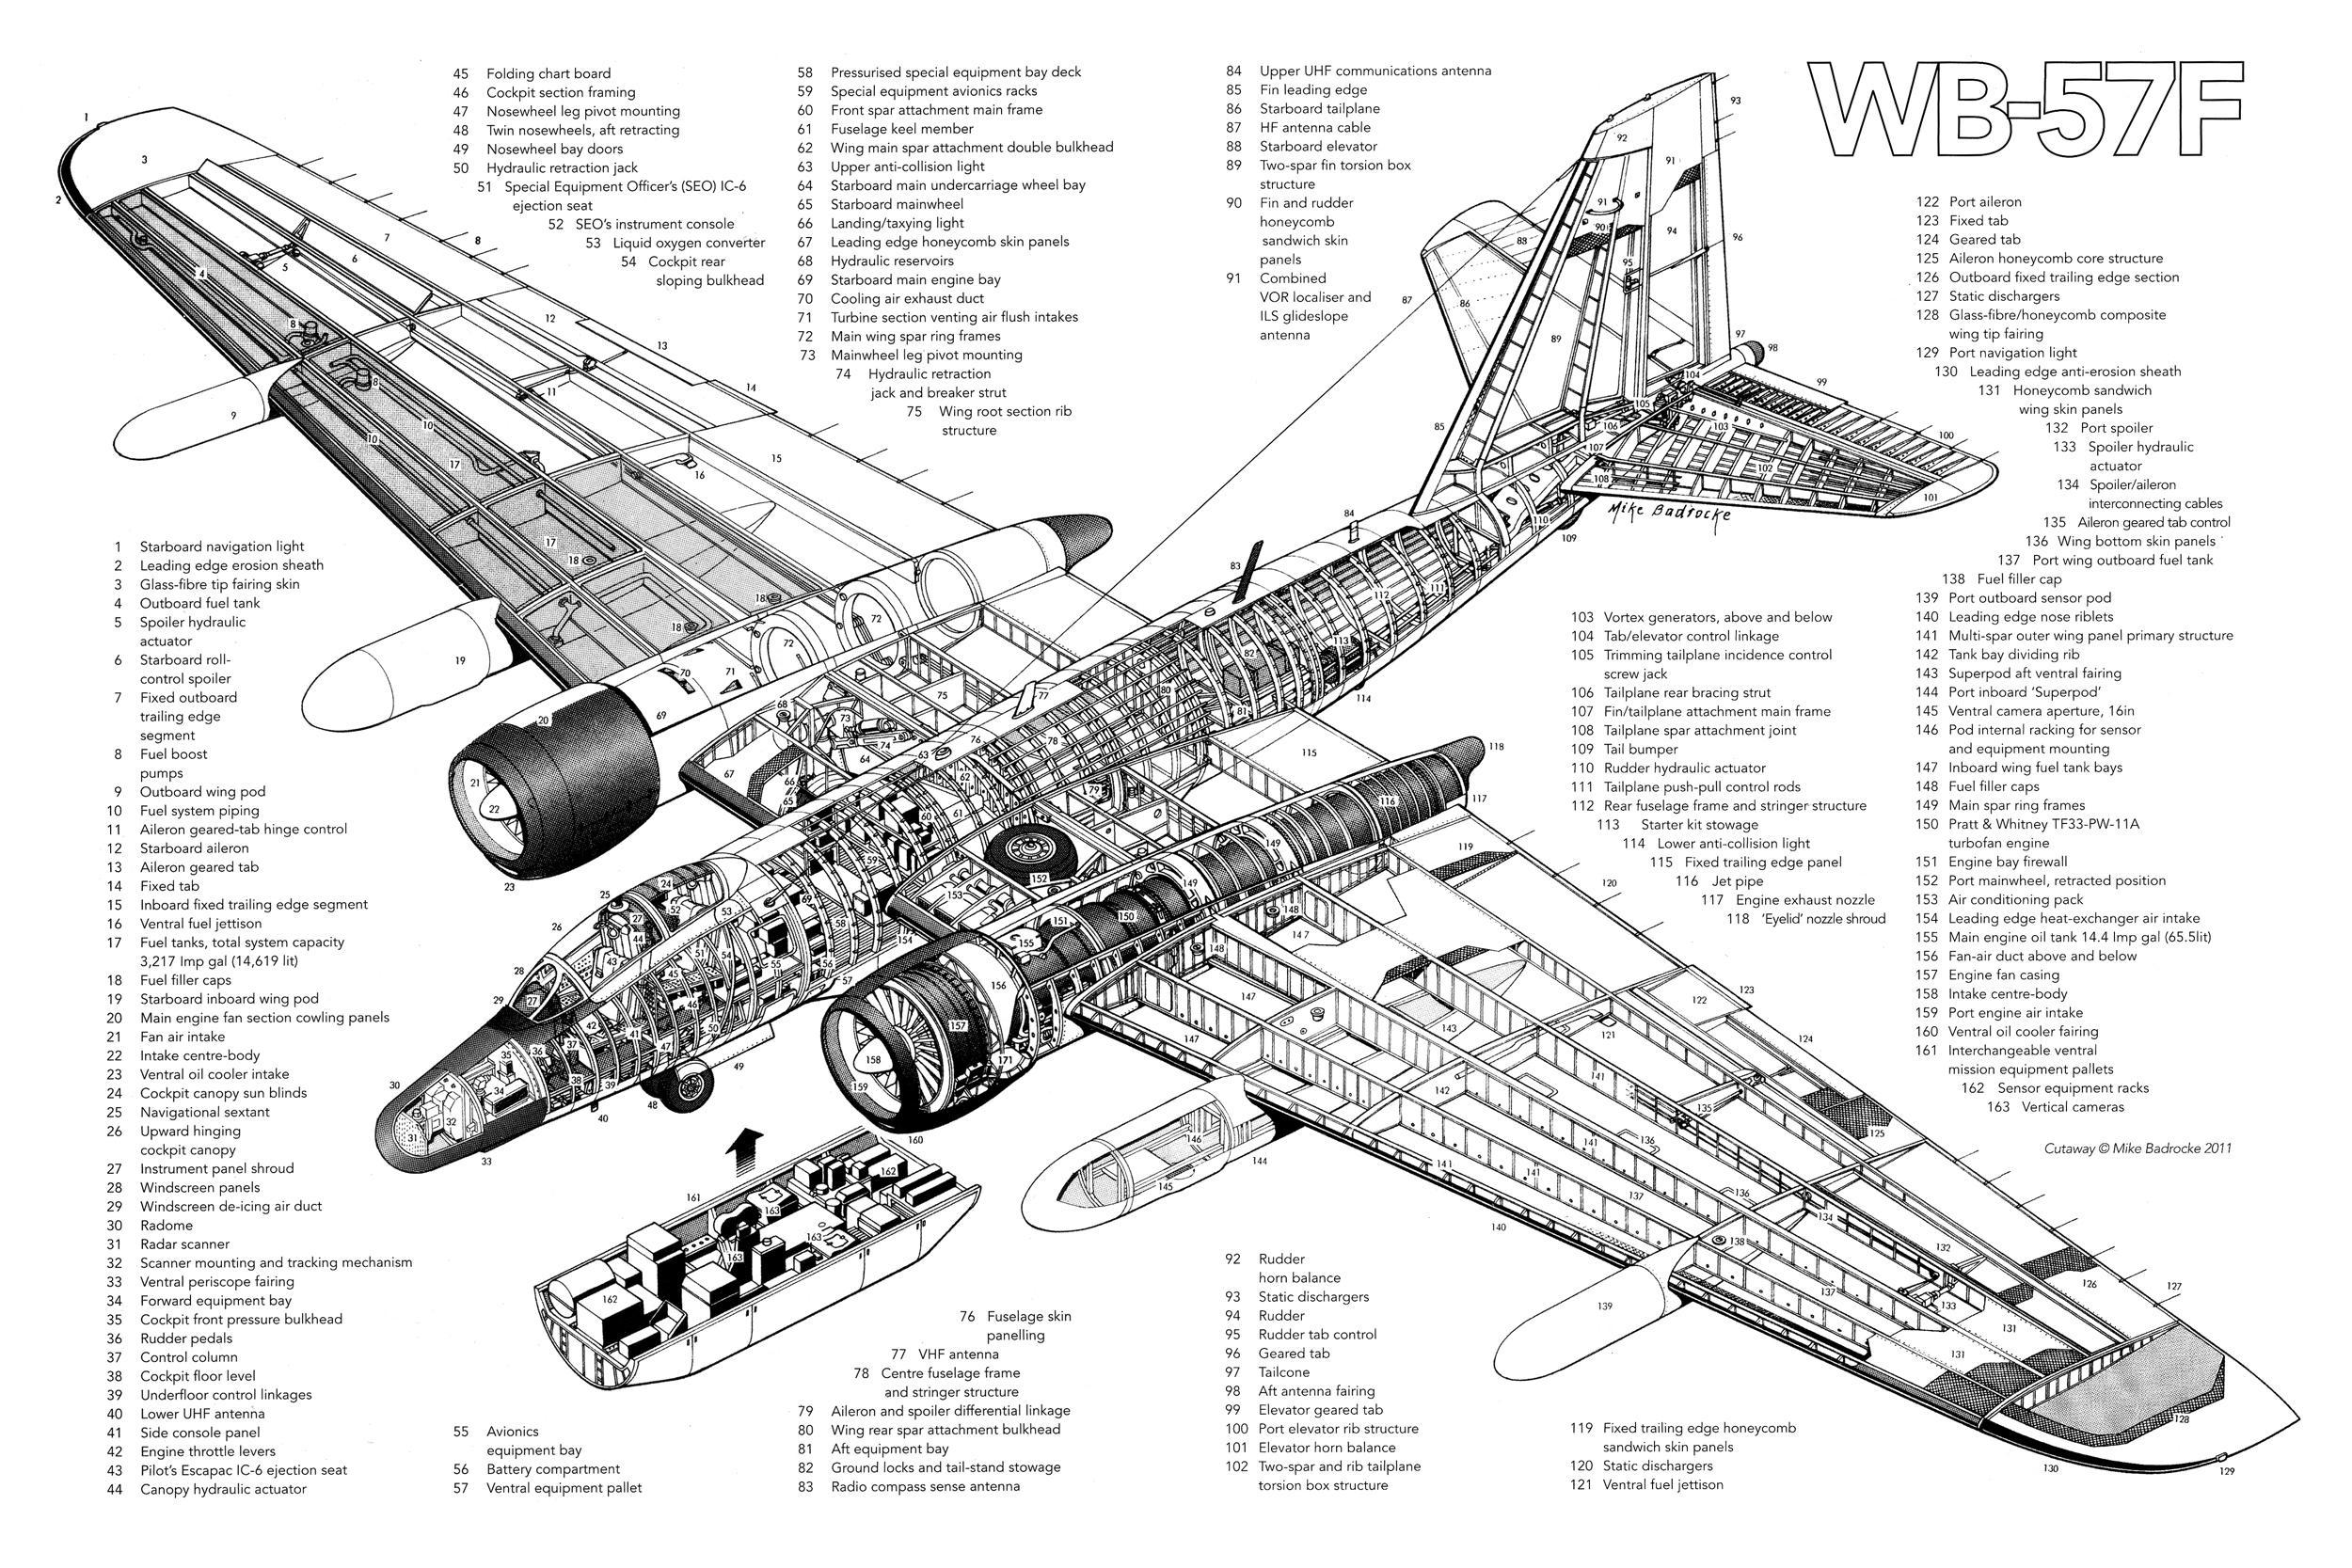 Martin Wb 57f Canberra By Mike Badrocke X